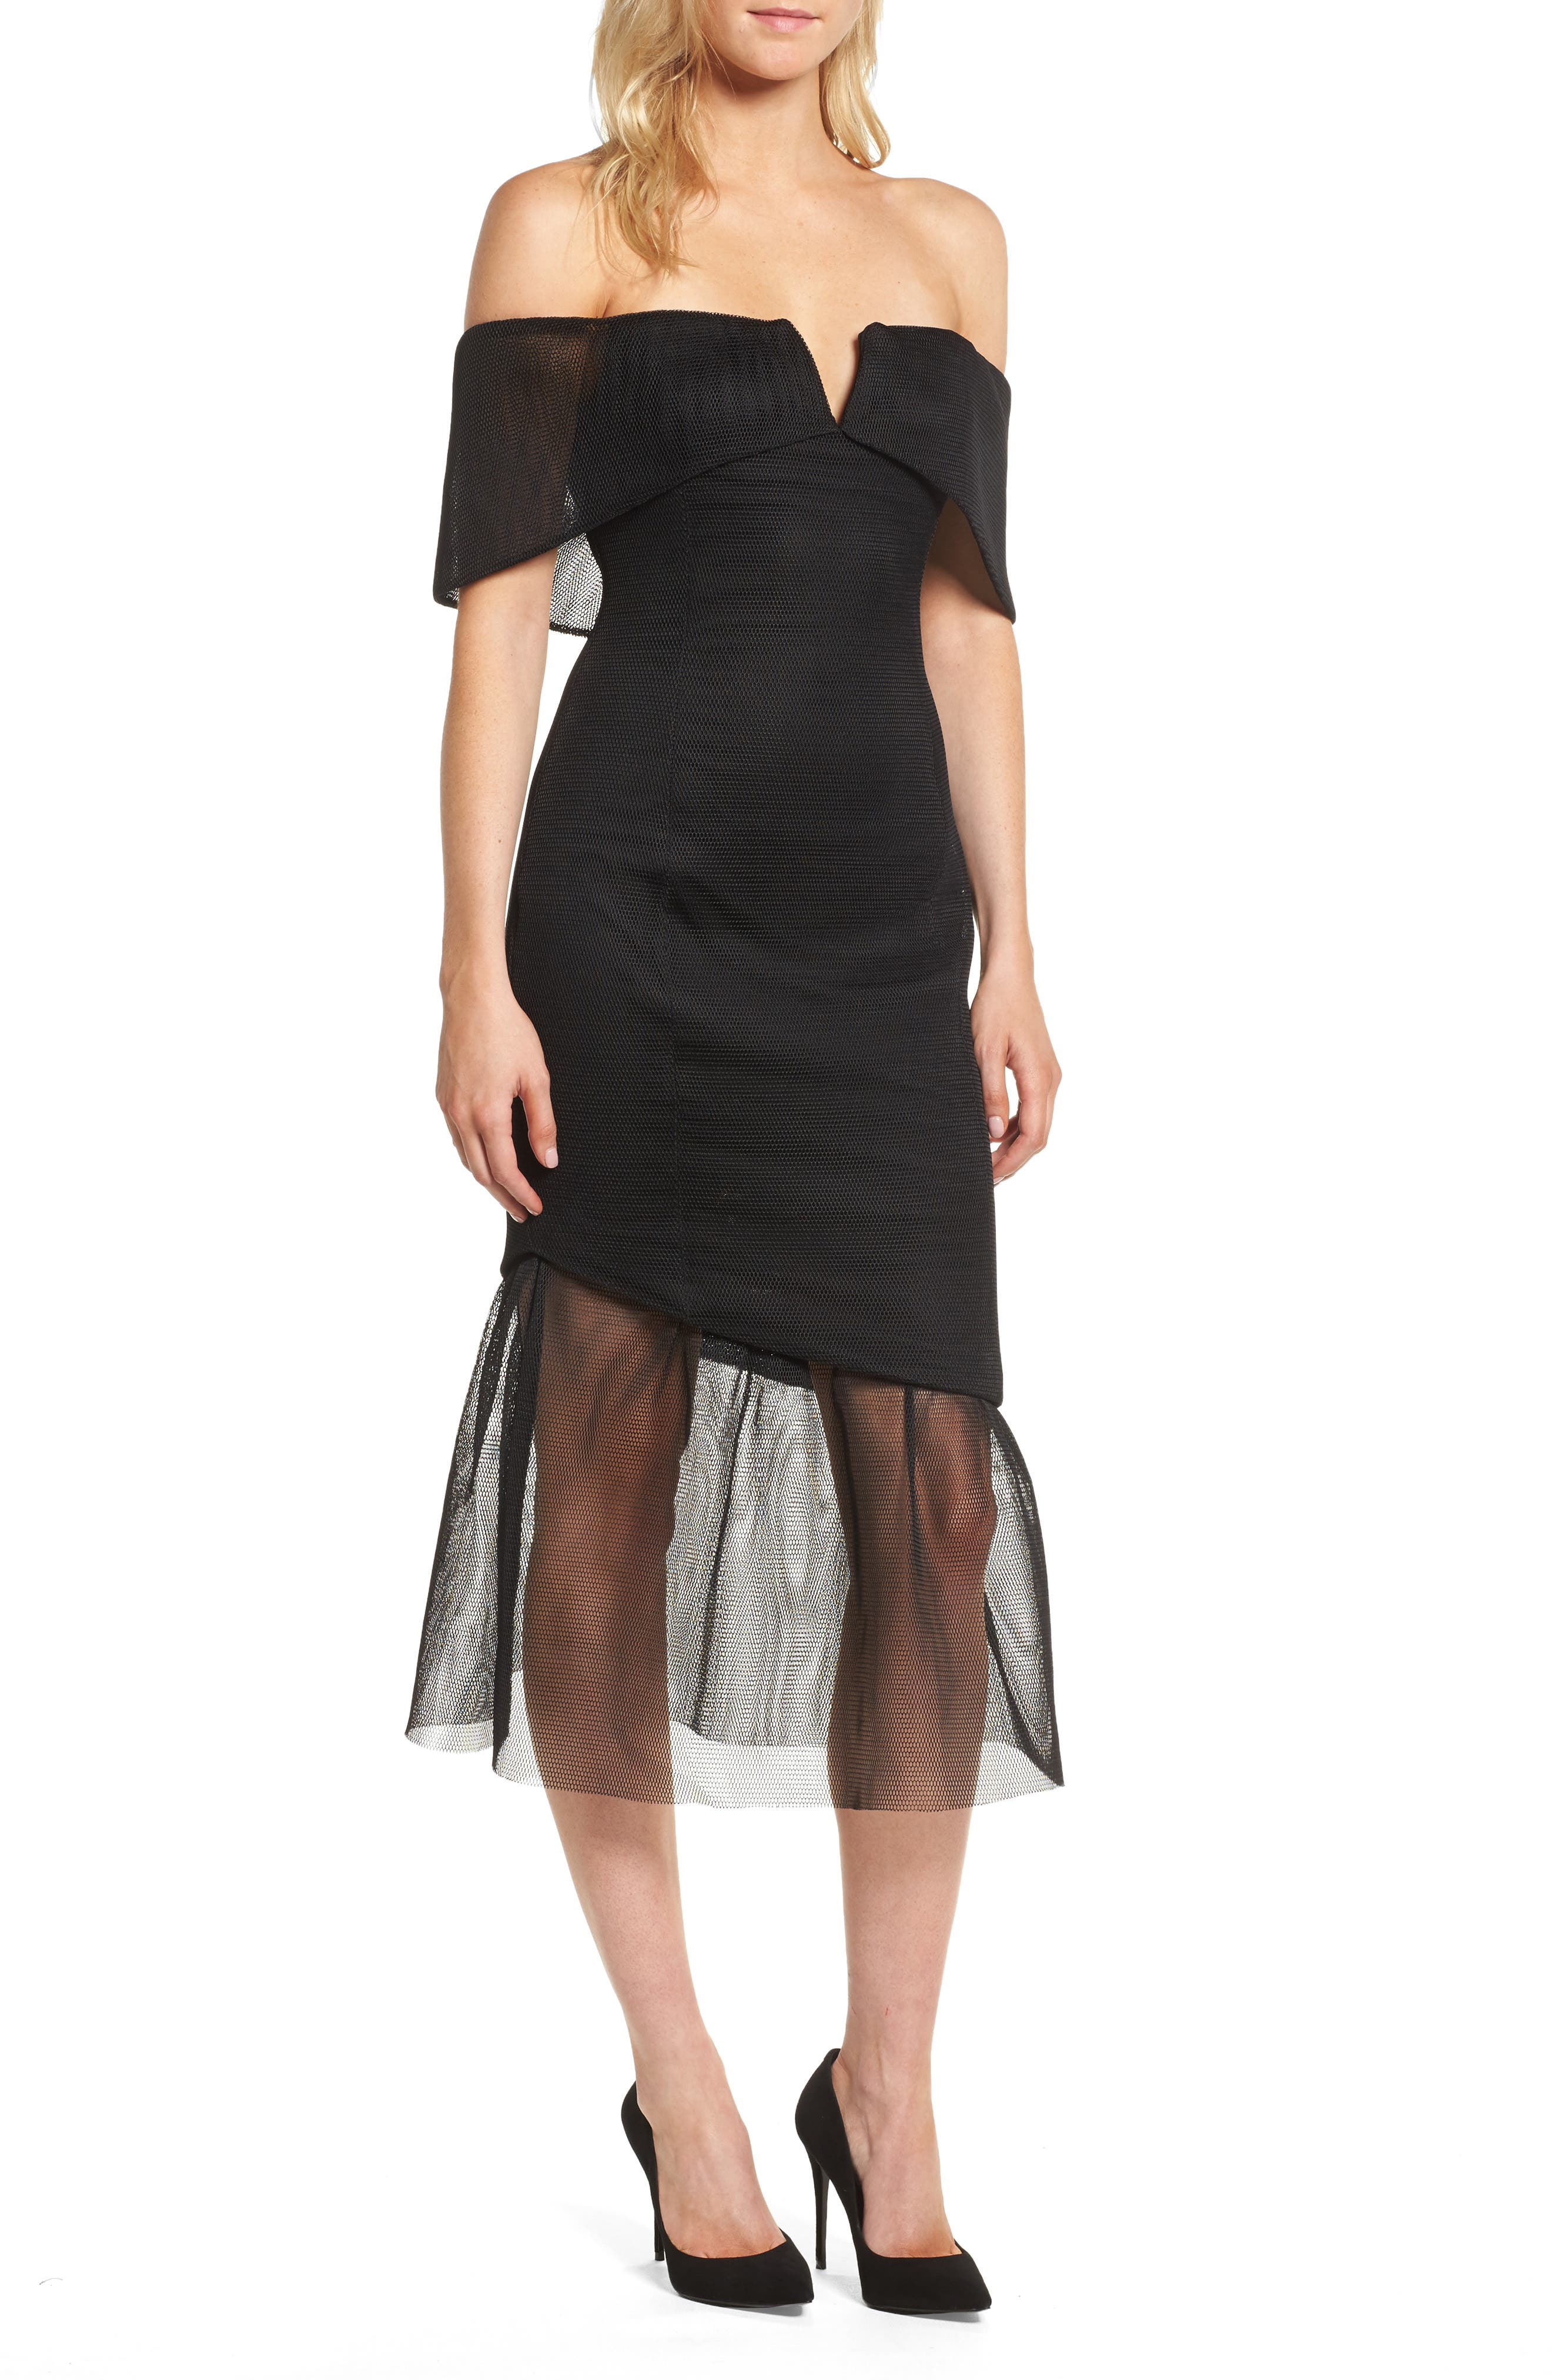 Alternate Image 1 Selected - Elliatt Fate Off the Shoulder Dress